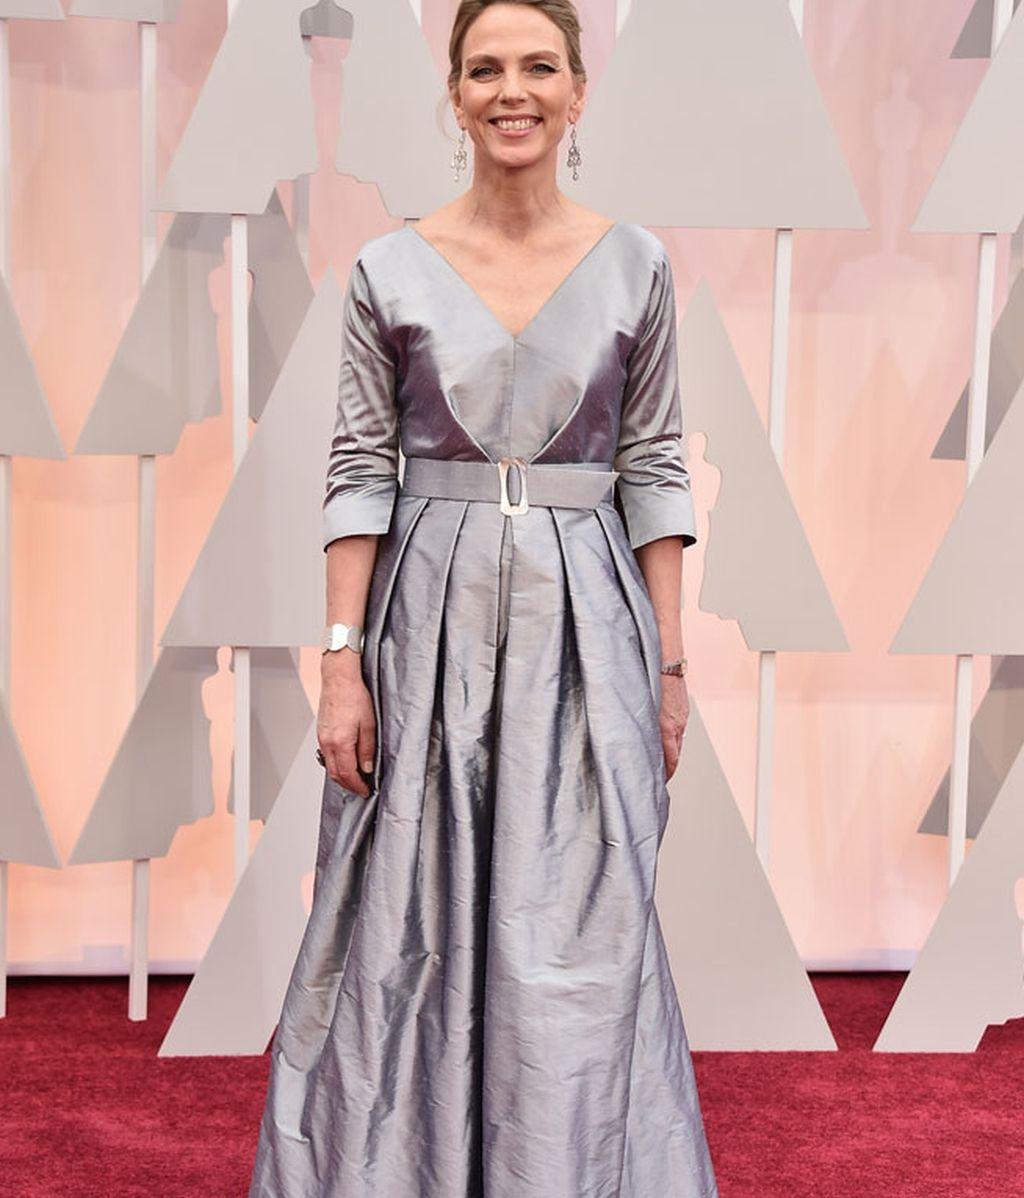 Tori Kove en la alfombra roja de los Oscar